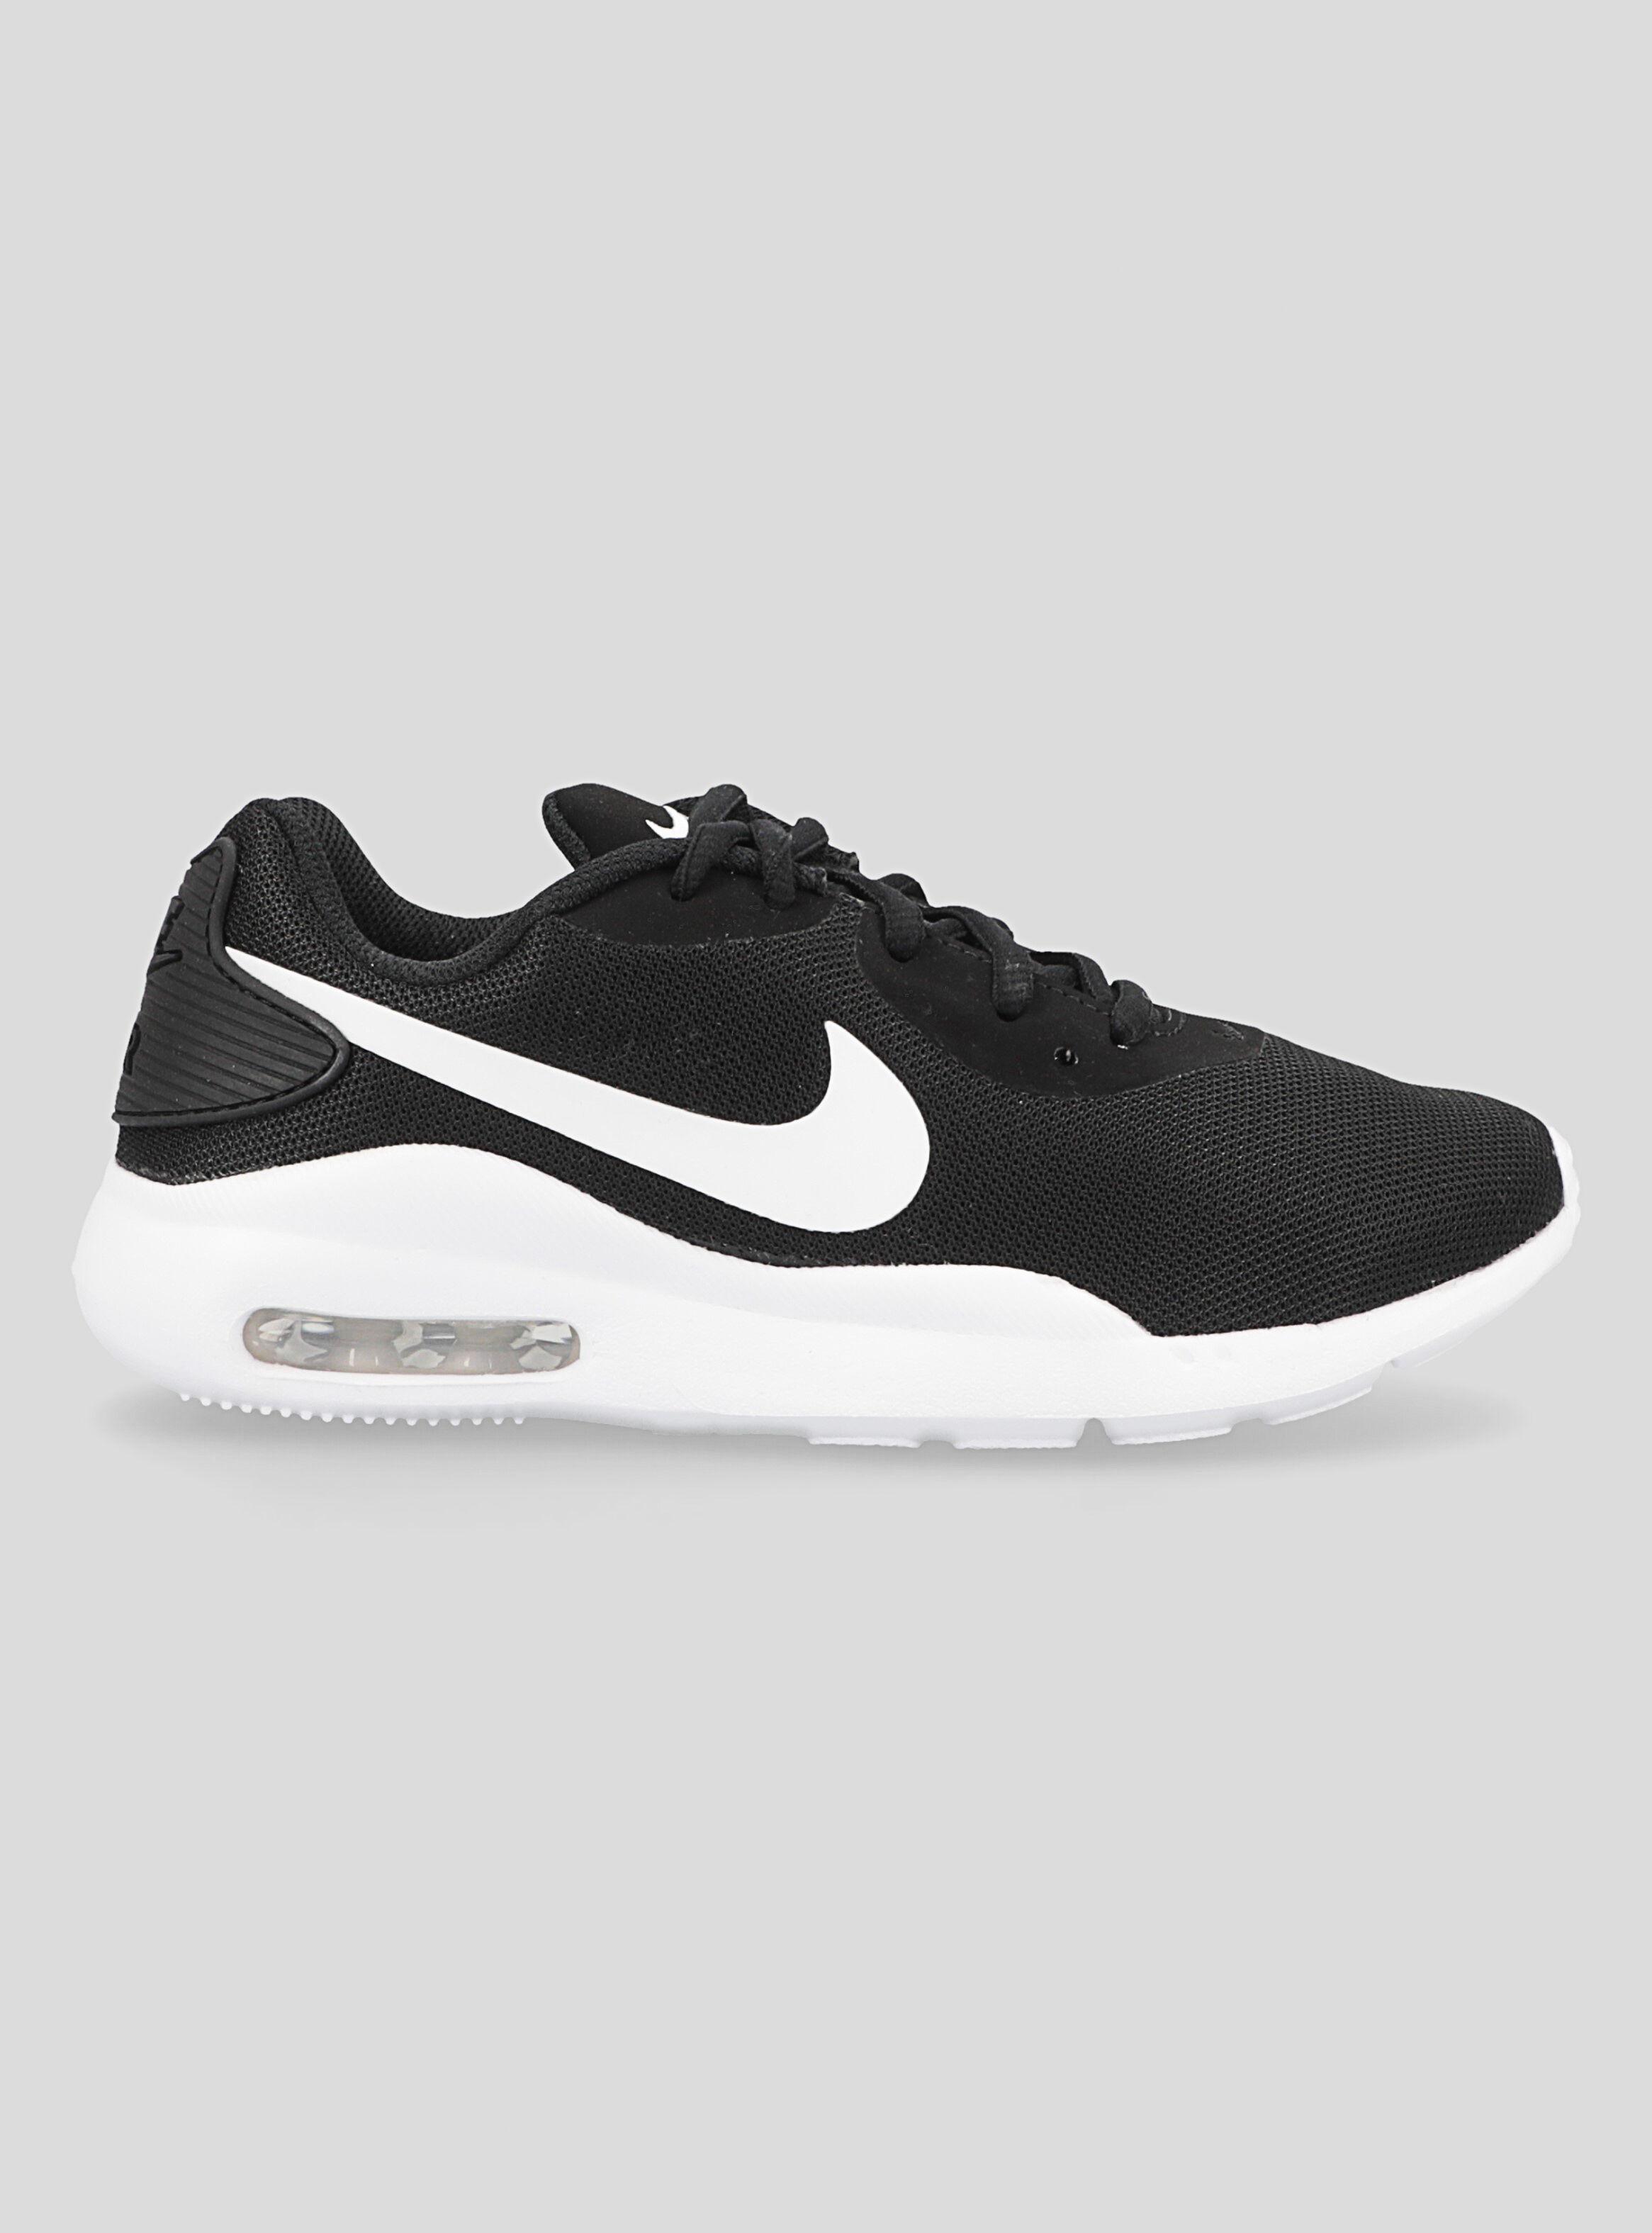 Zapatilla Nike WMNS Air Max Oketo Urbana Muer